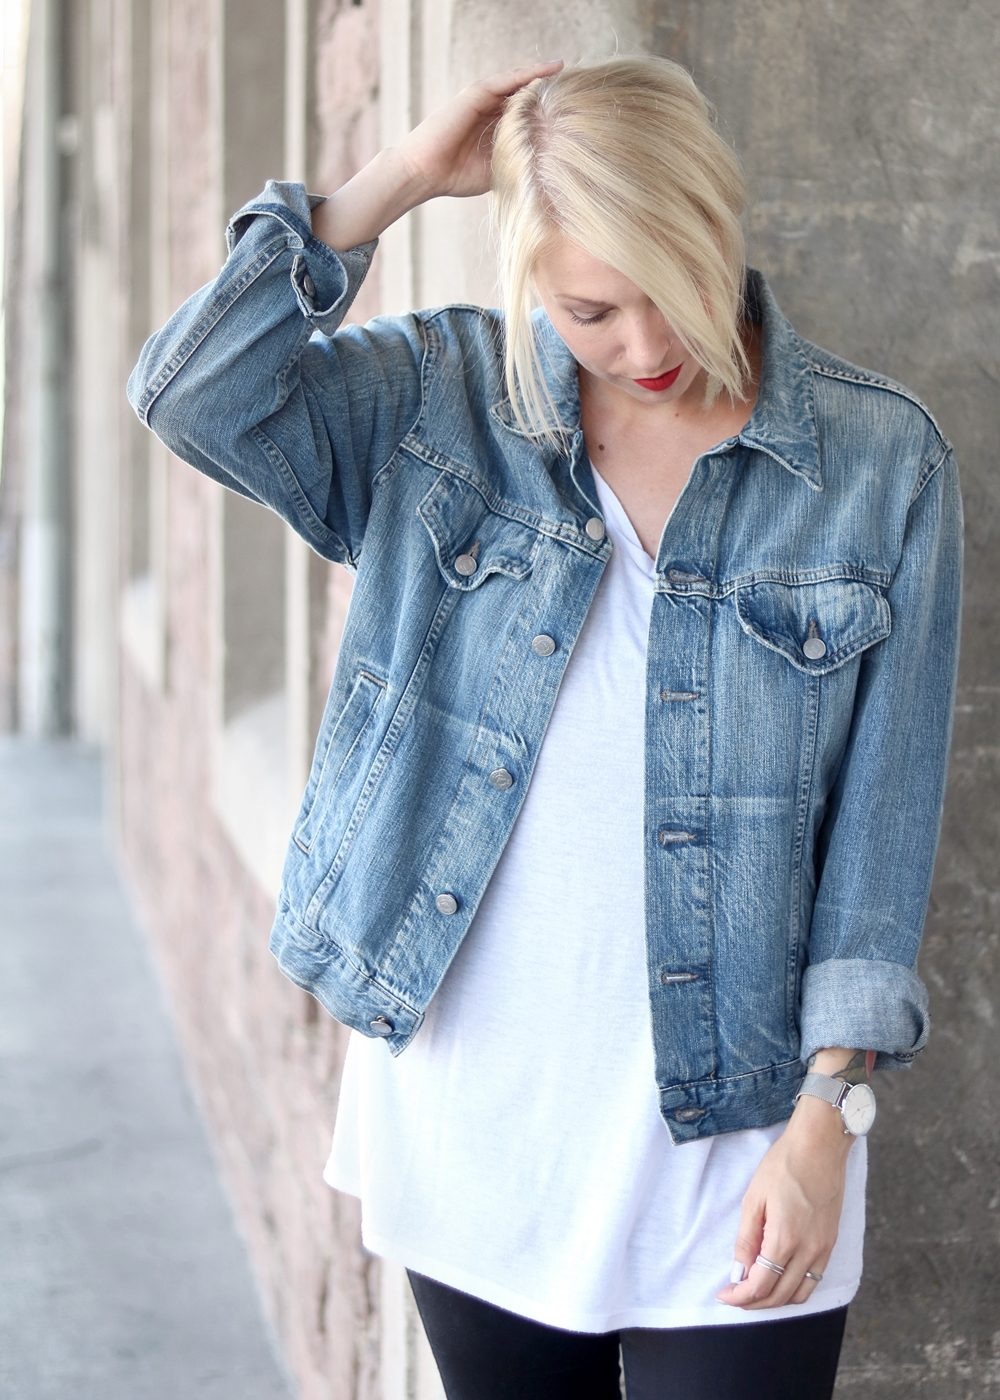 fashionbloggerin-karlsruhe-outfit-jeansjacke-armani-skinny-jeans-only-sneaker-8